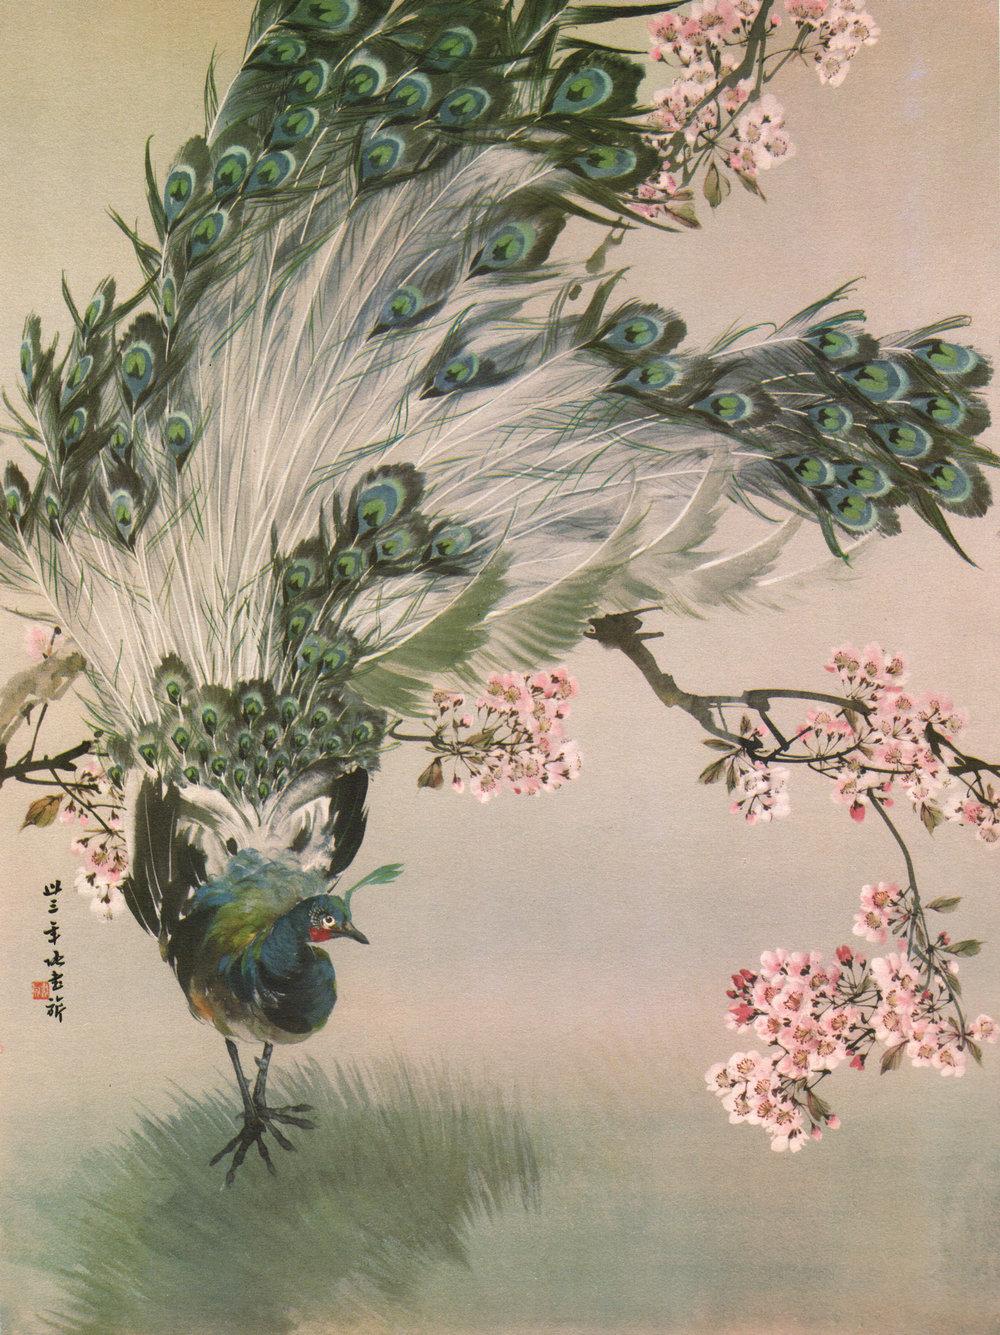 Vintage Japanese & Chinese bird art